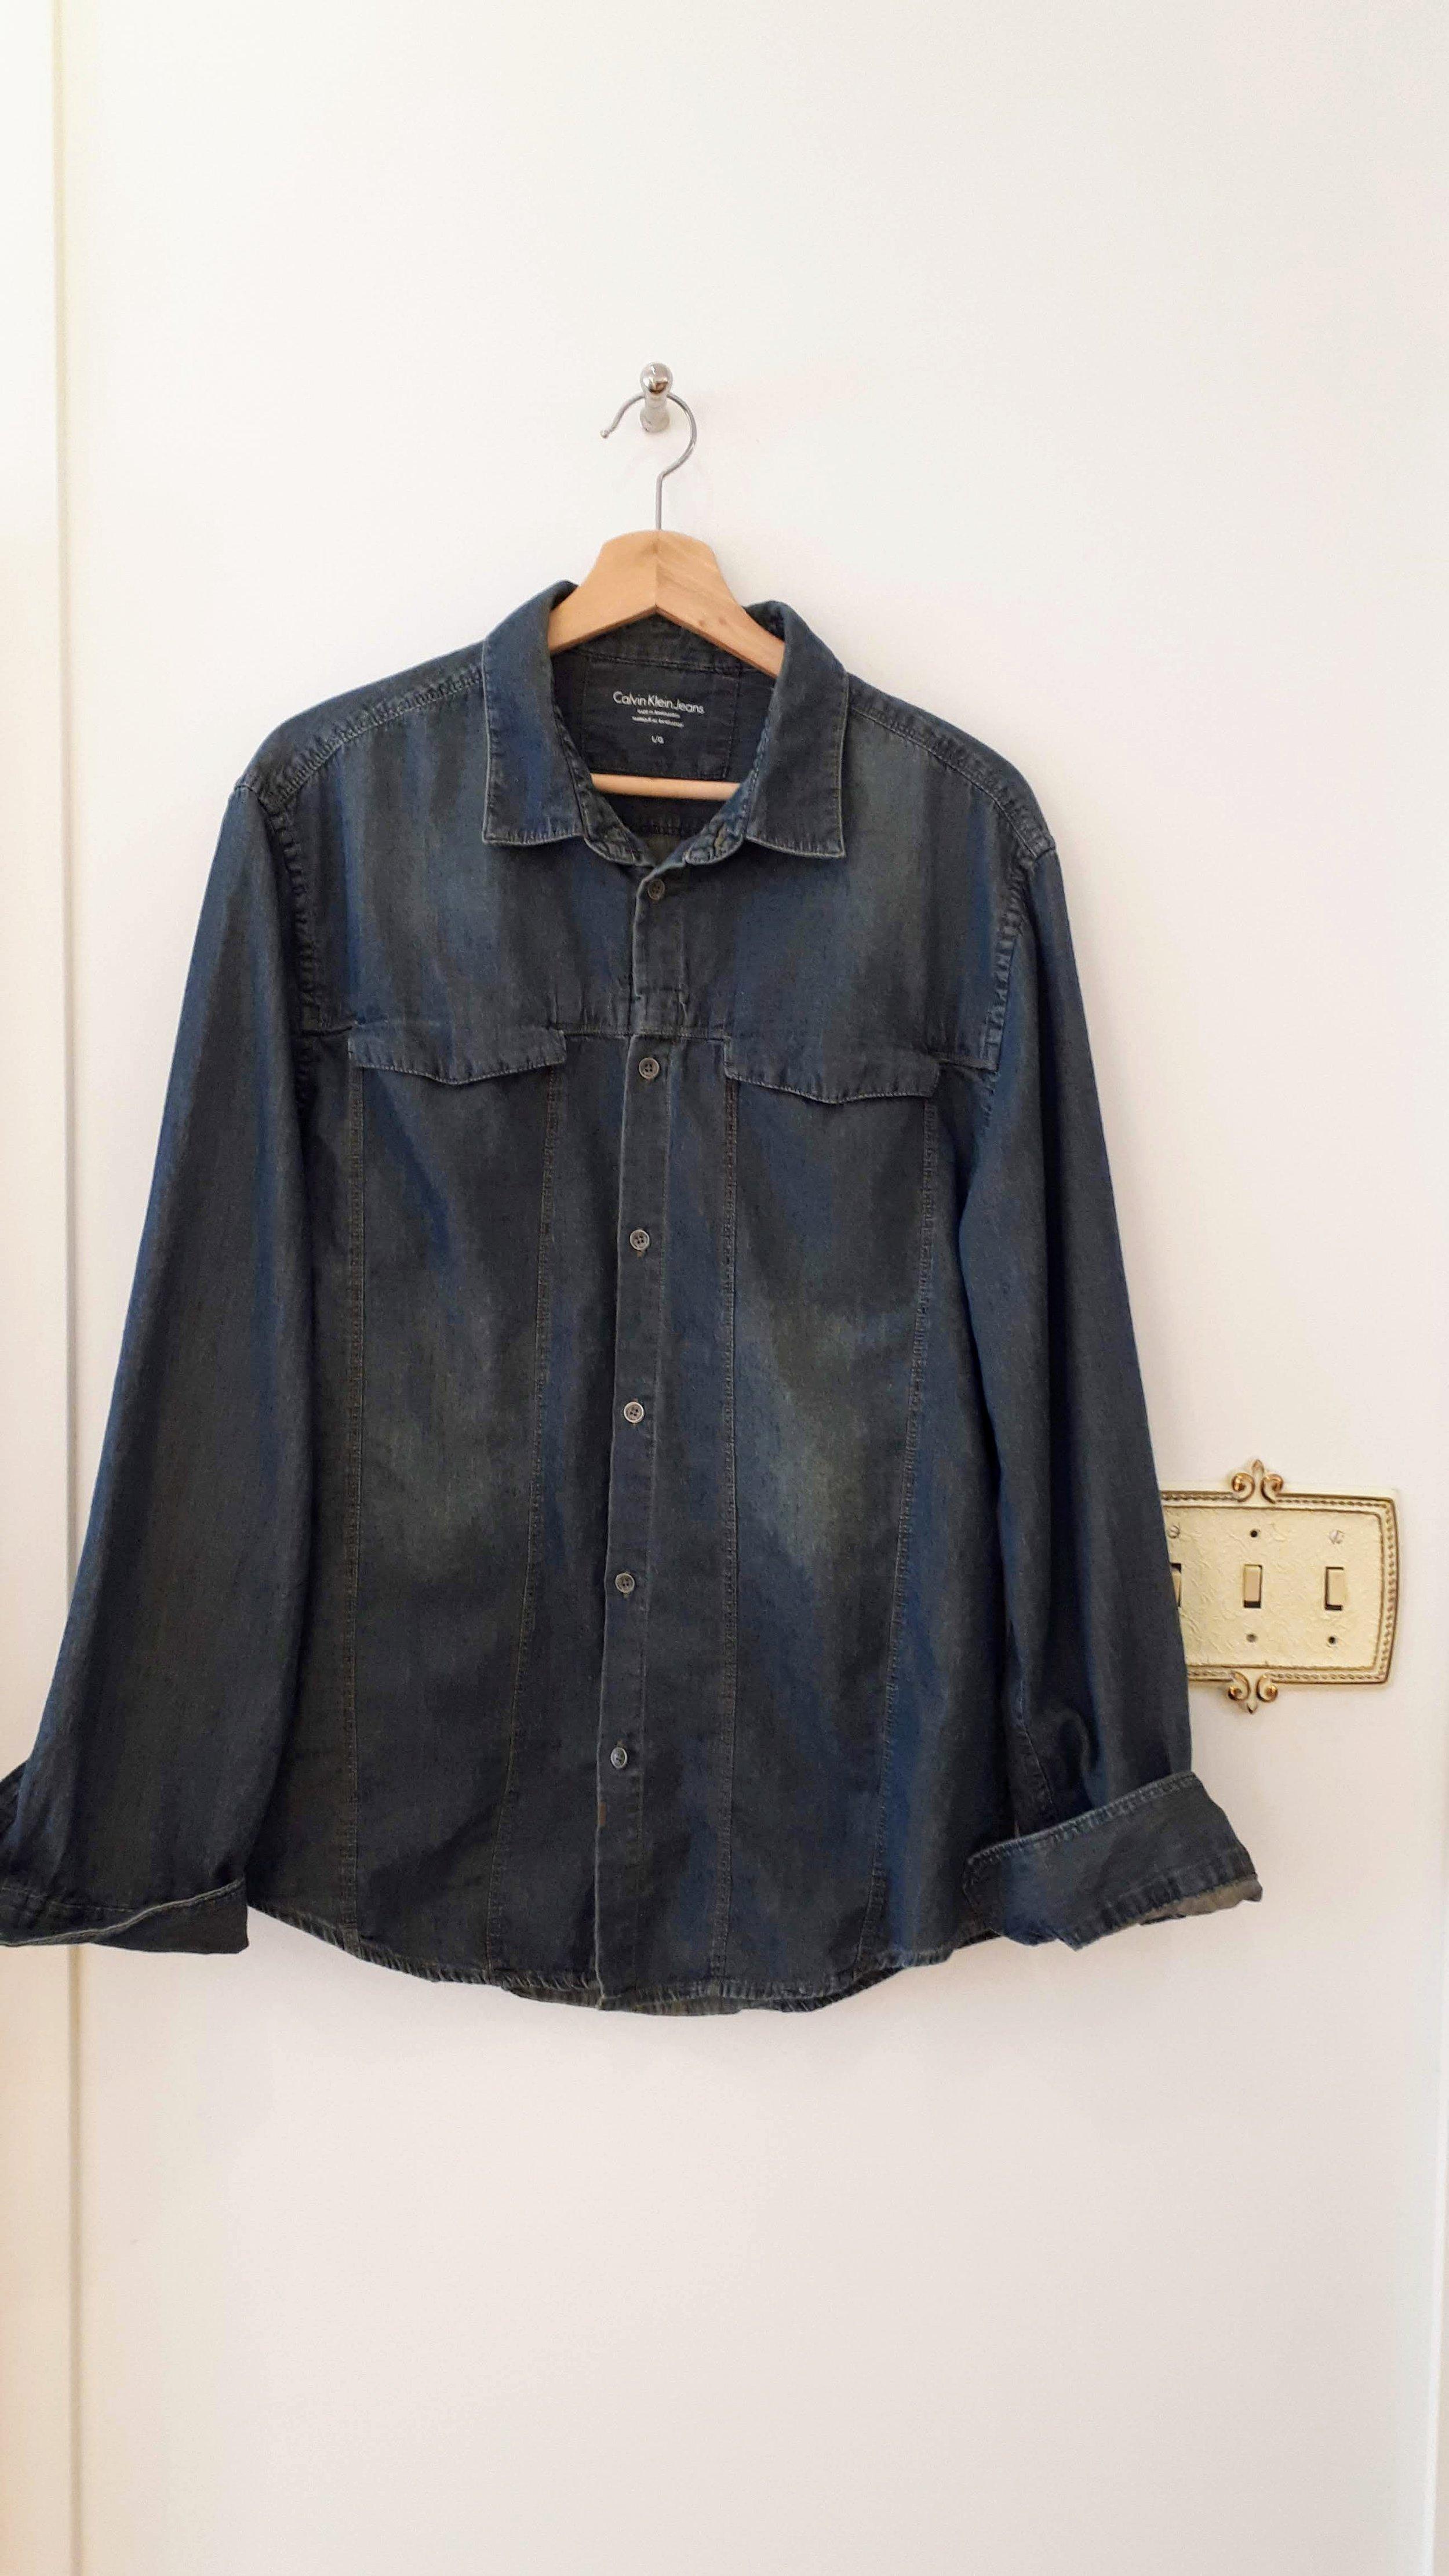 Calvin Klein mens shirt; Size L, $28